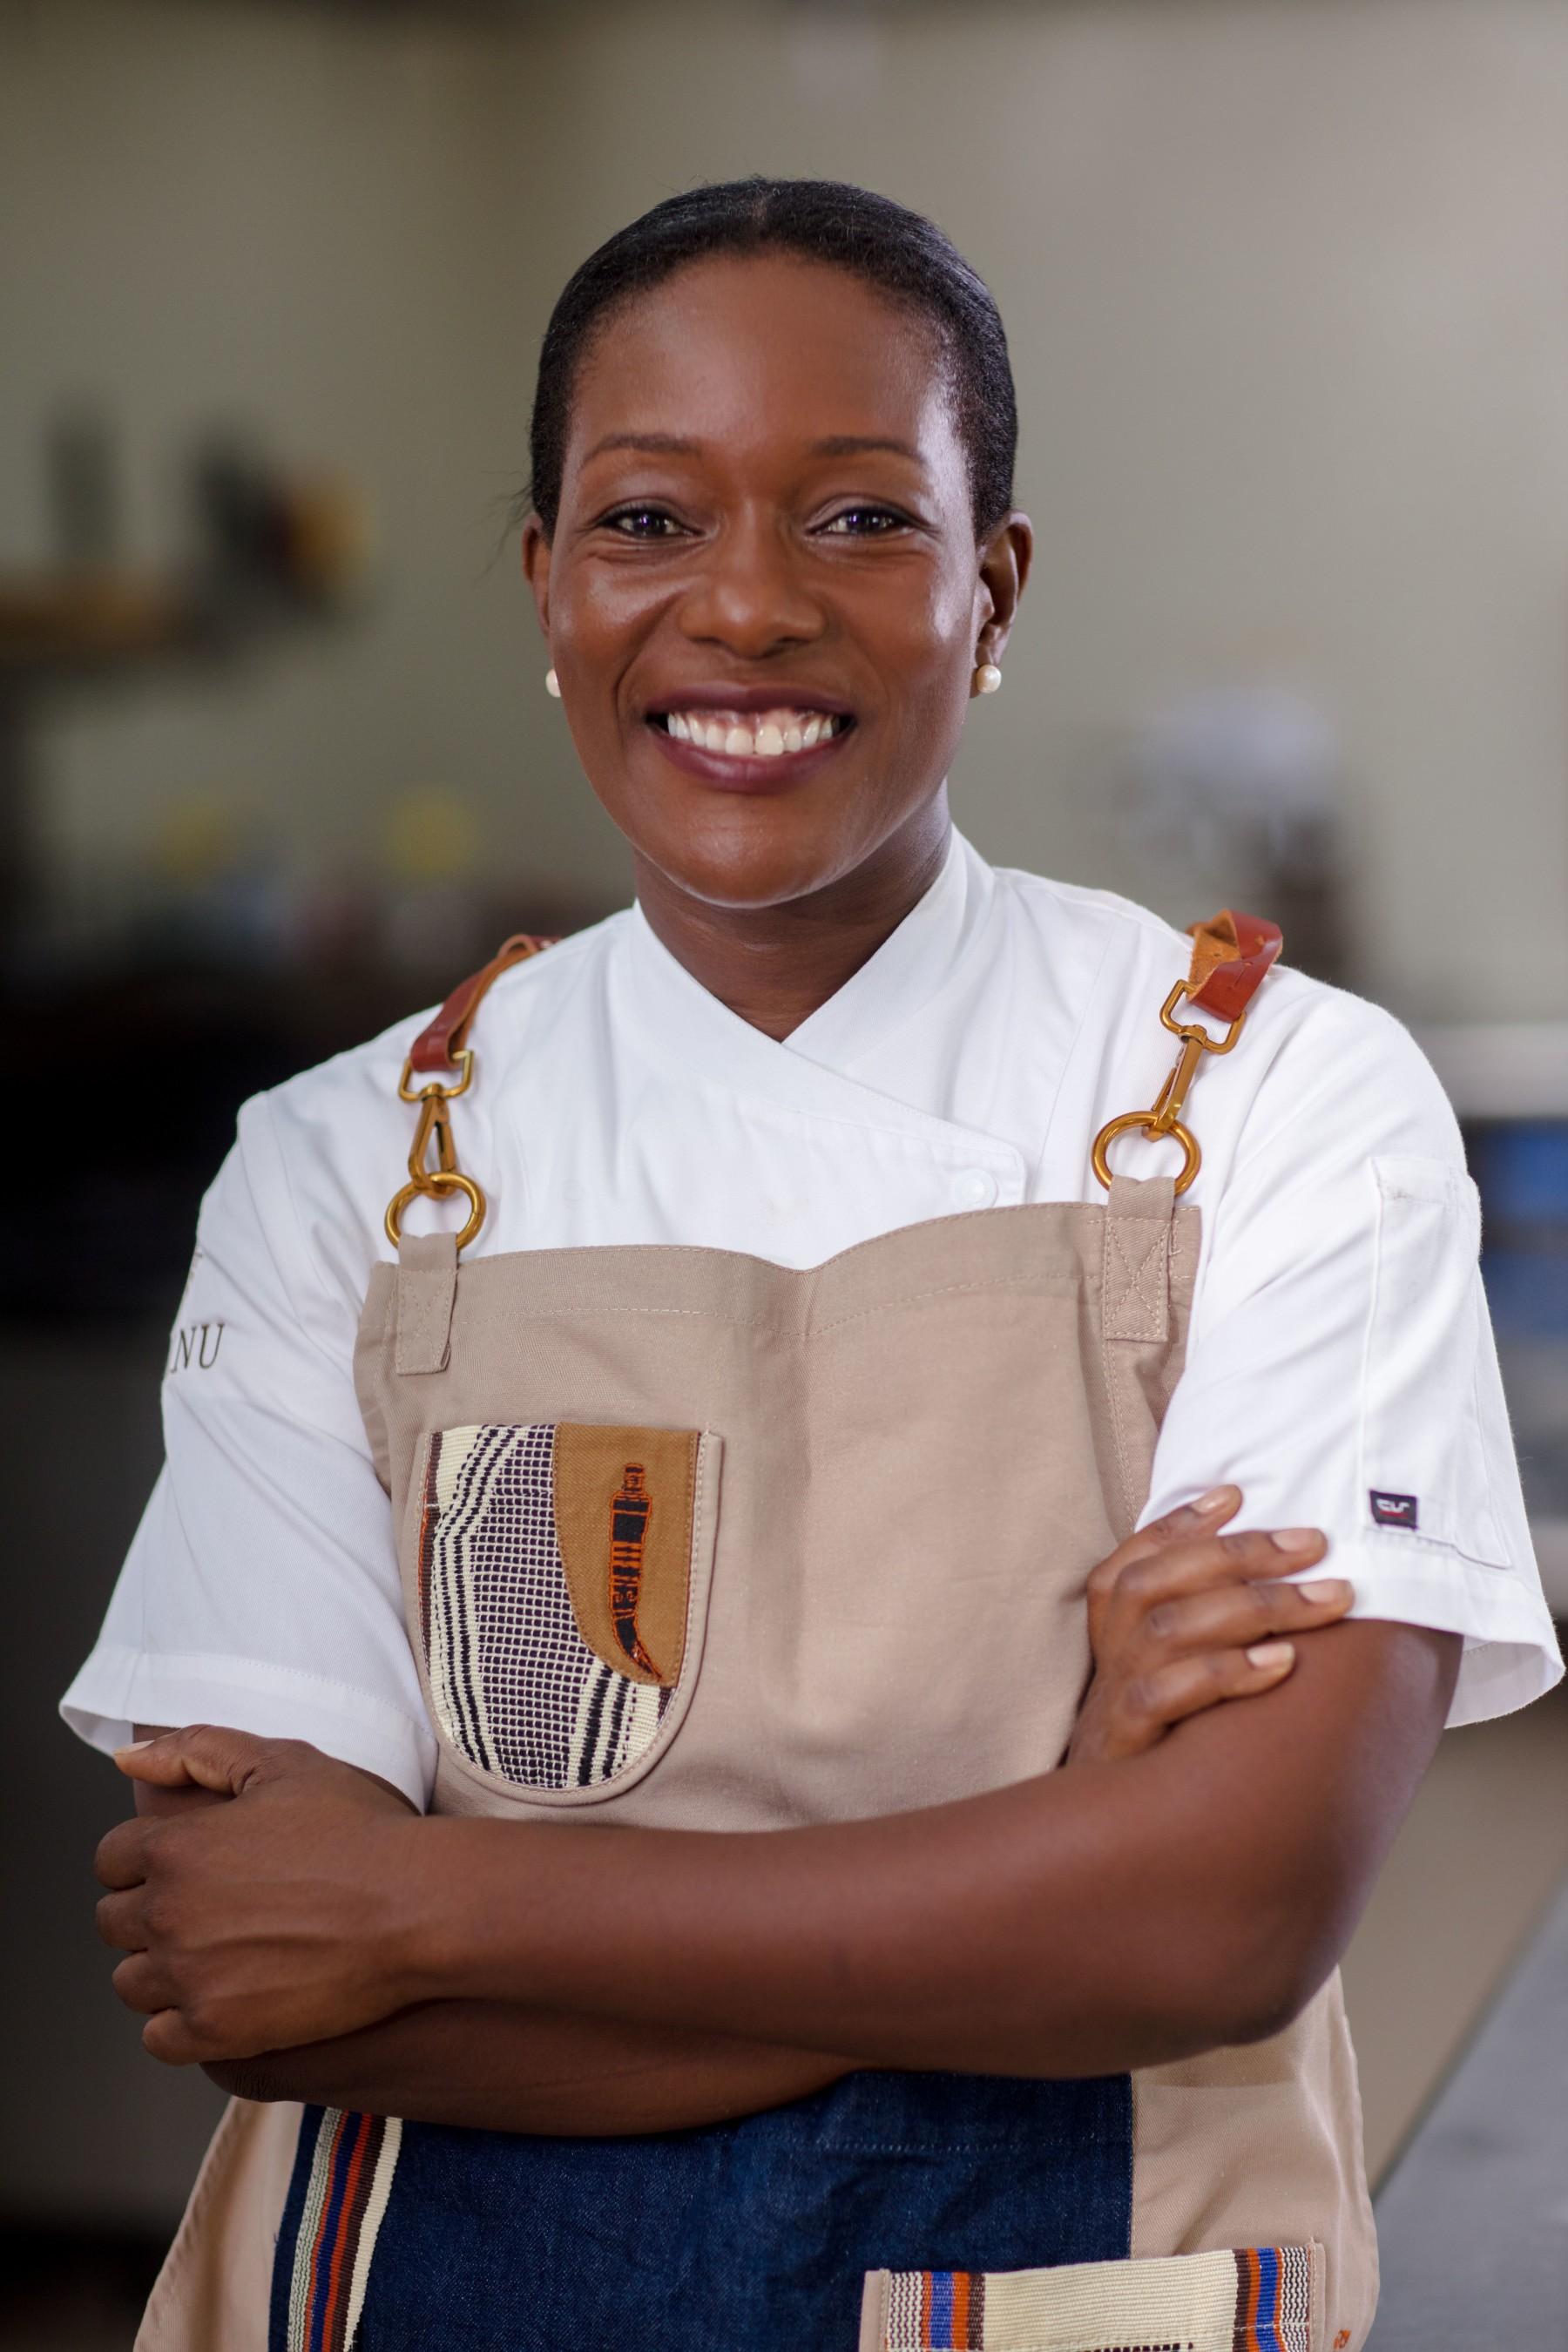 Chef Selassie Atadika - Carlyn Thompson